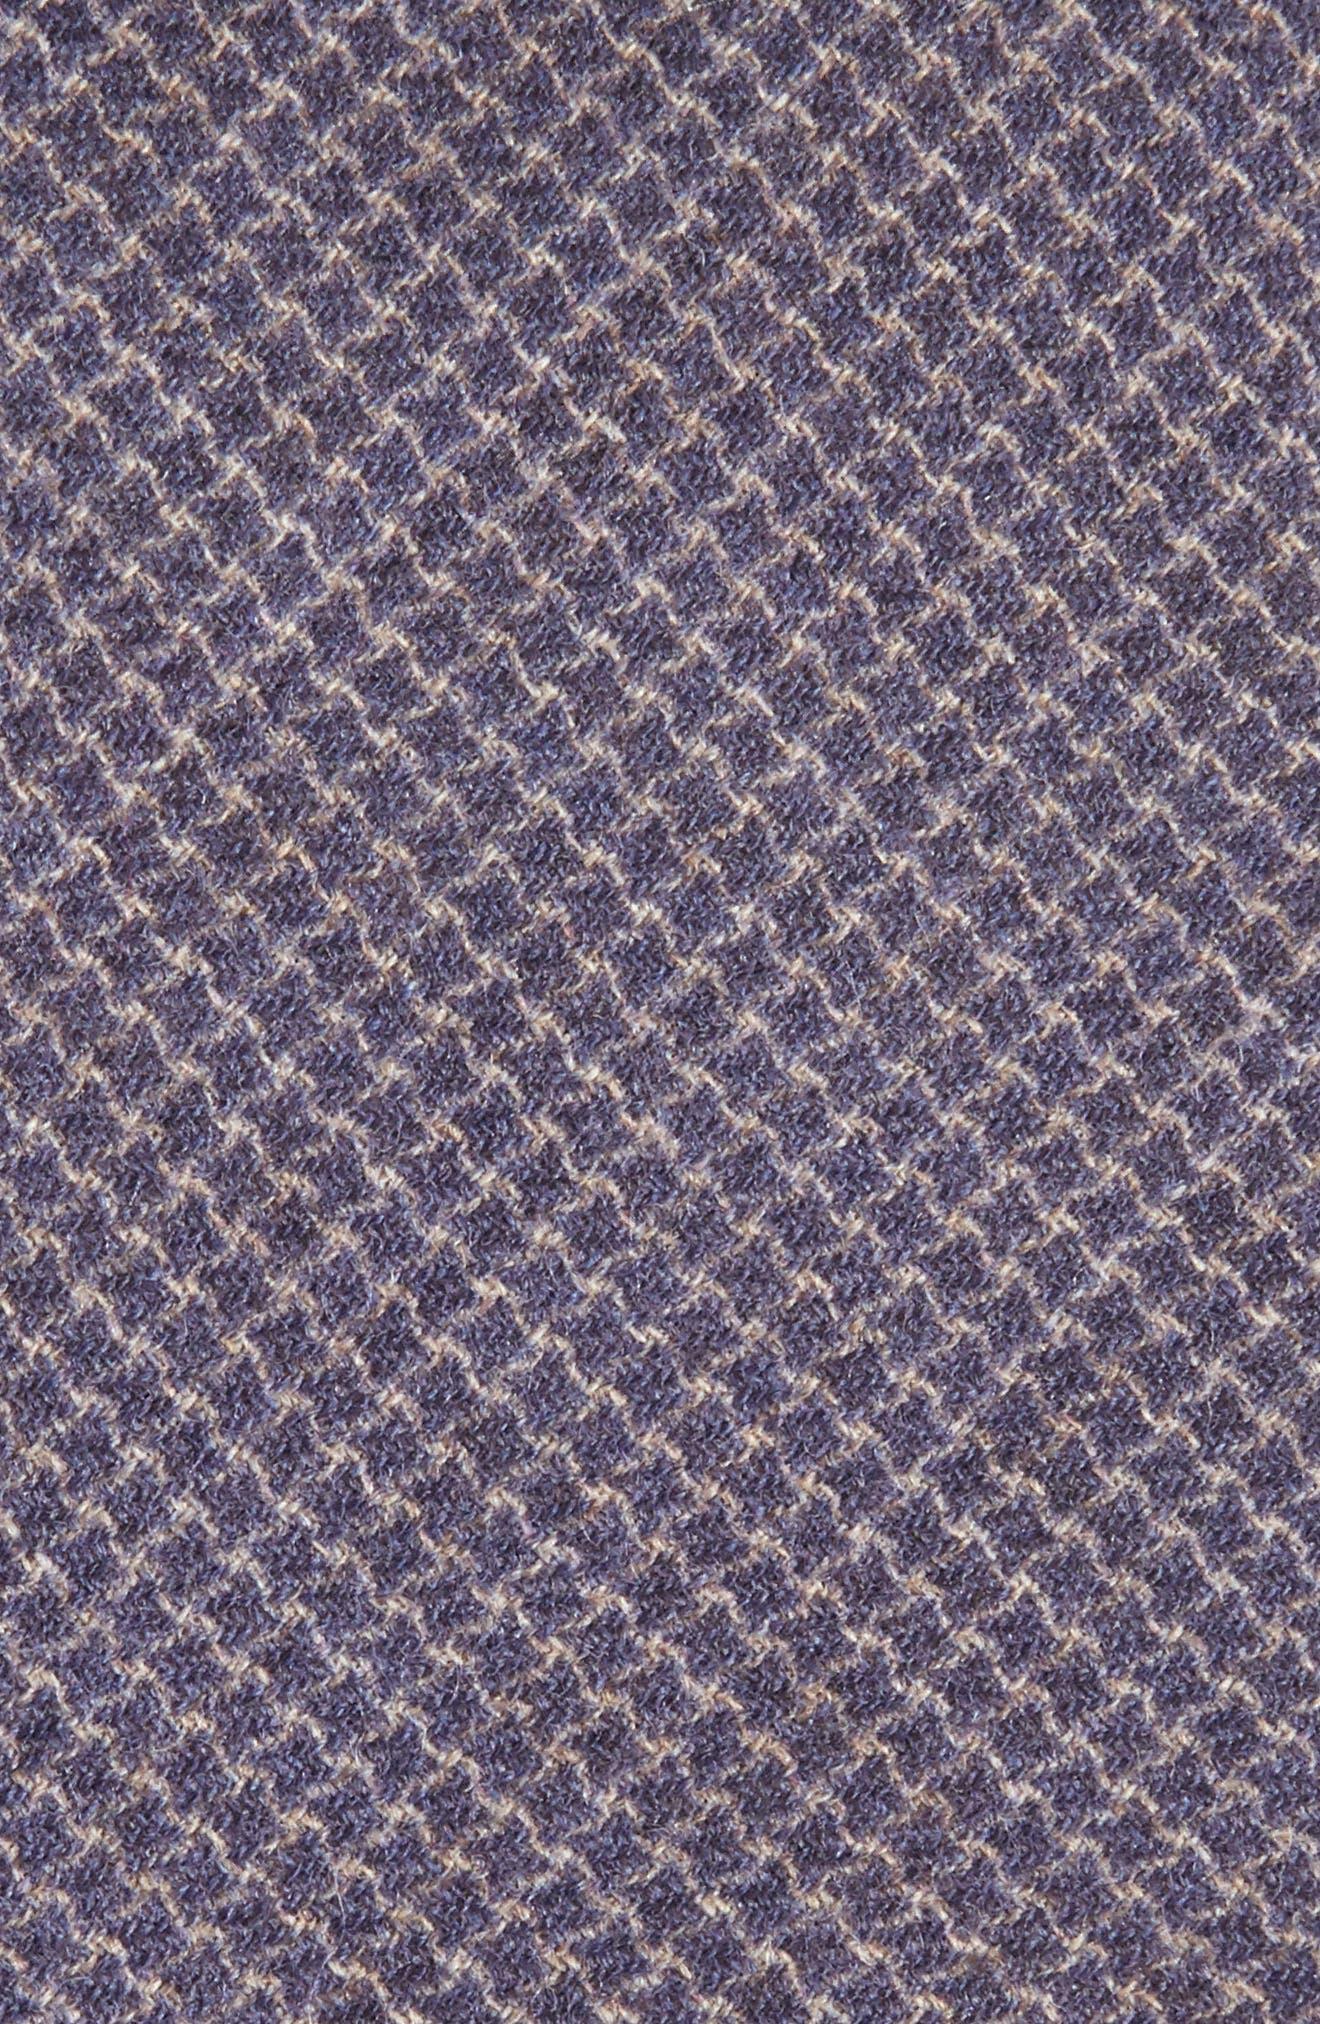 Geometric Wool Tie,                             Alternate thumbnail 6, color,